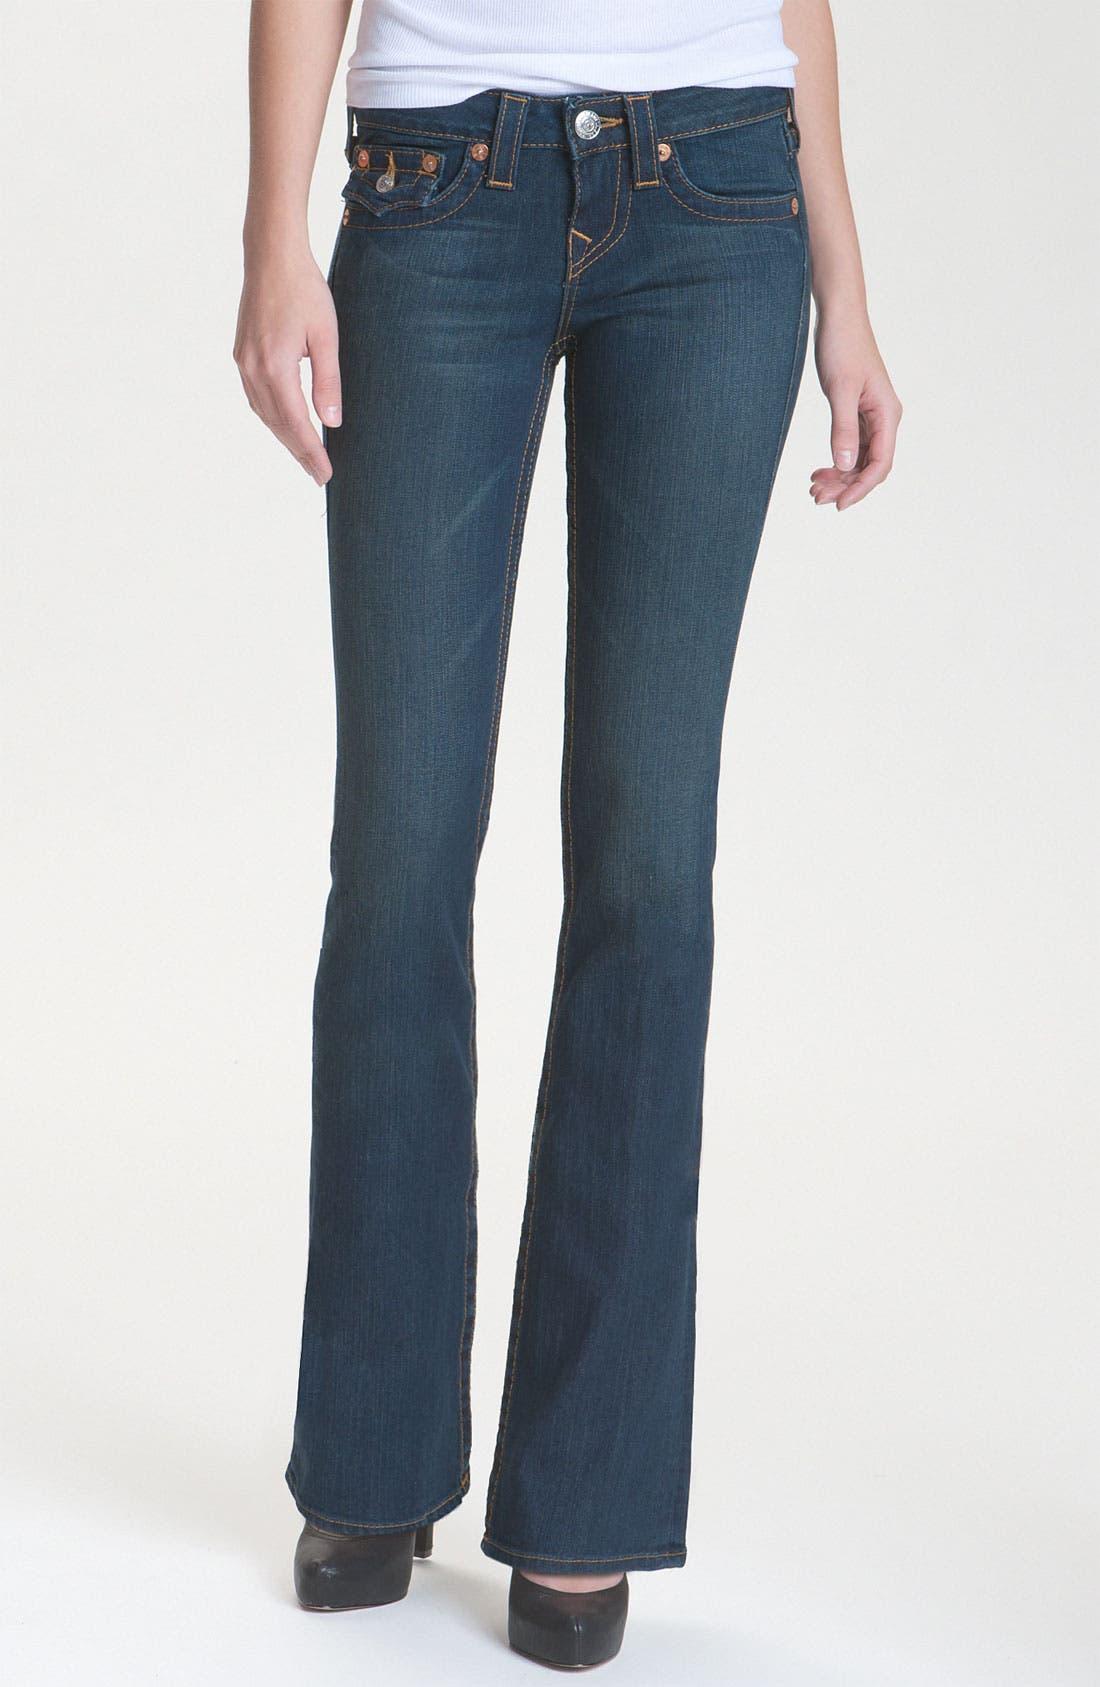 Main Image - True Religion Brand Jeans 'Becky' Bootcut Jeans (Vera Cruz) (Petite)